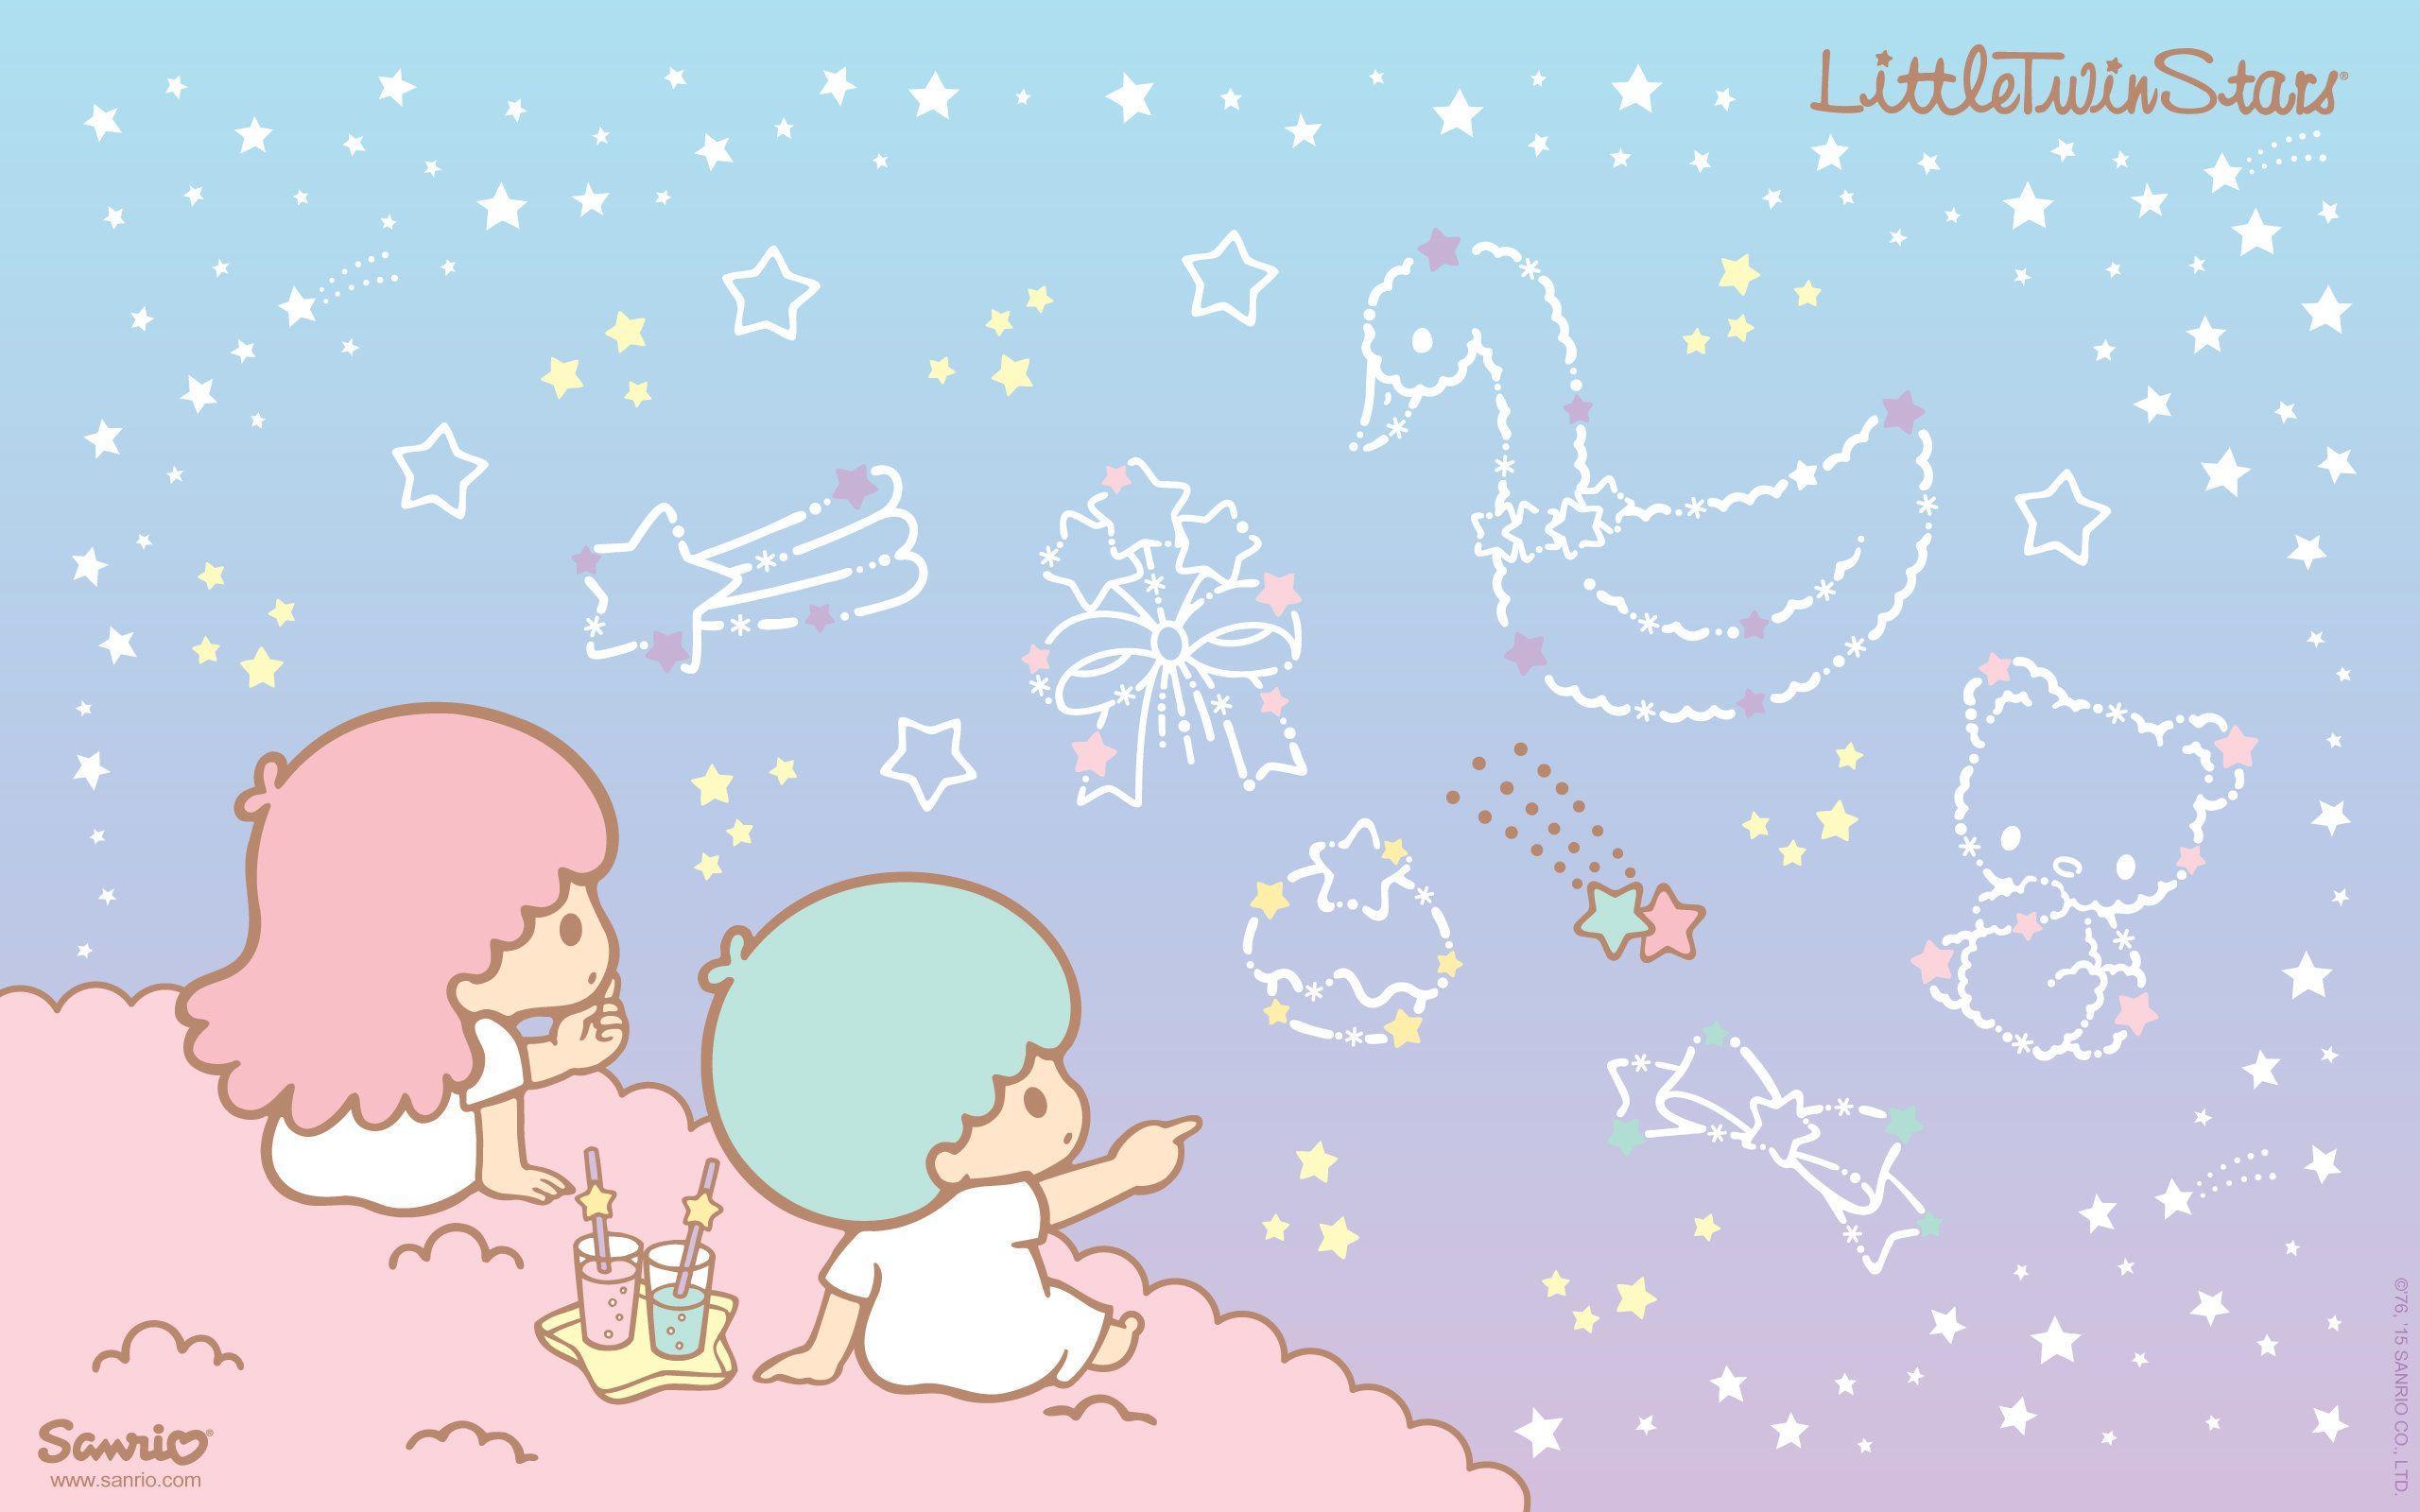 Cartoon Stars Wallpapers - Top Free Cartoon Stars Backgrounds - WallpaperAccess